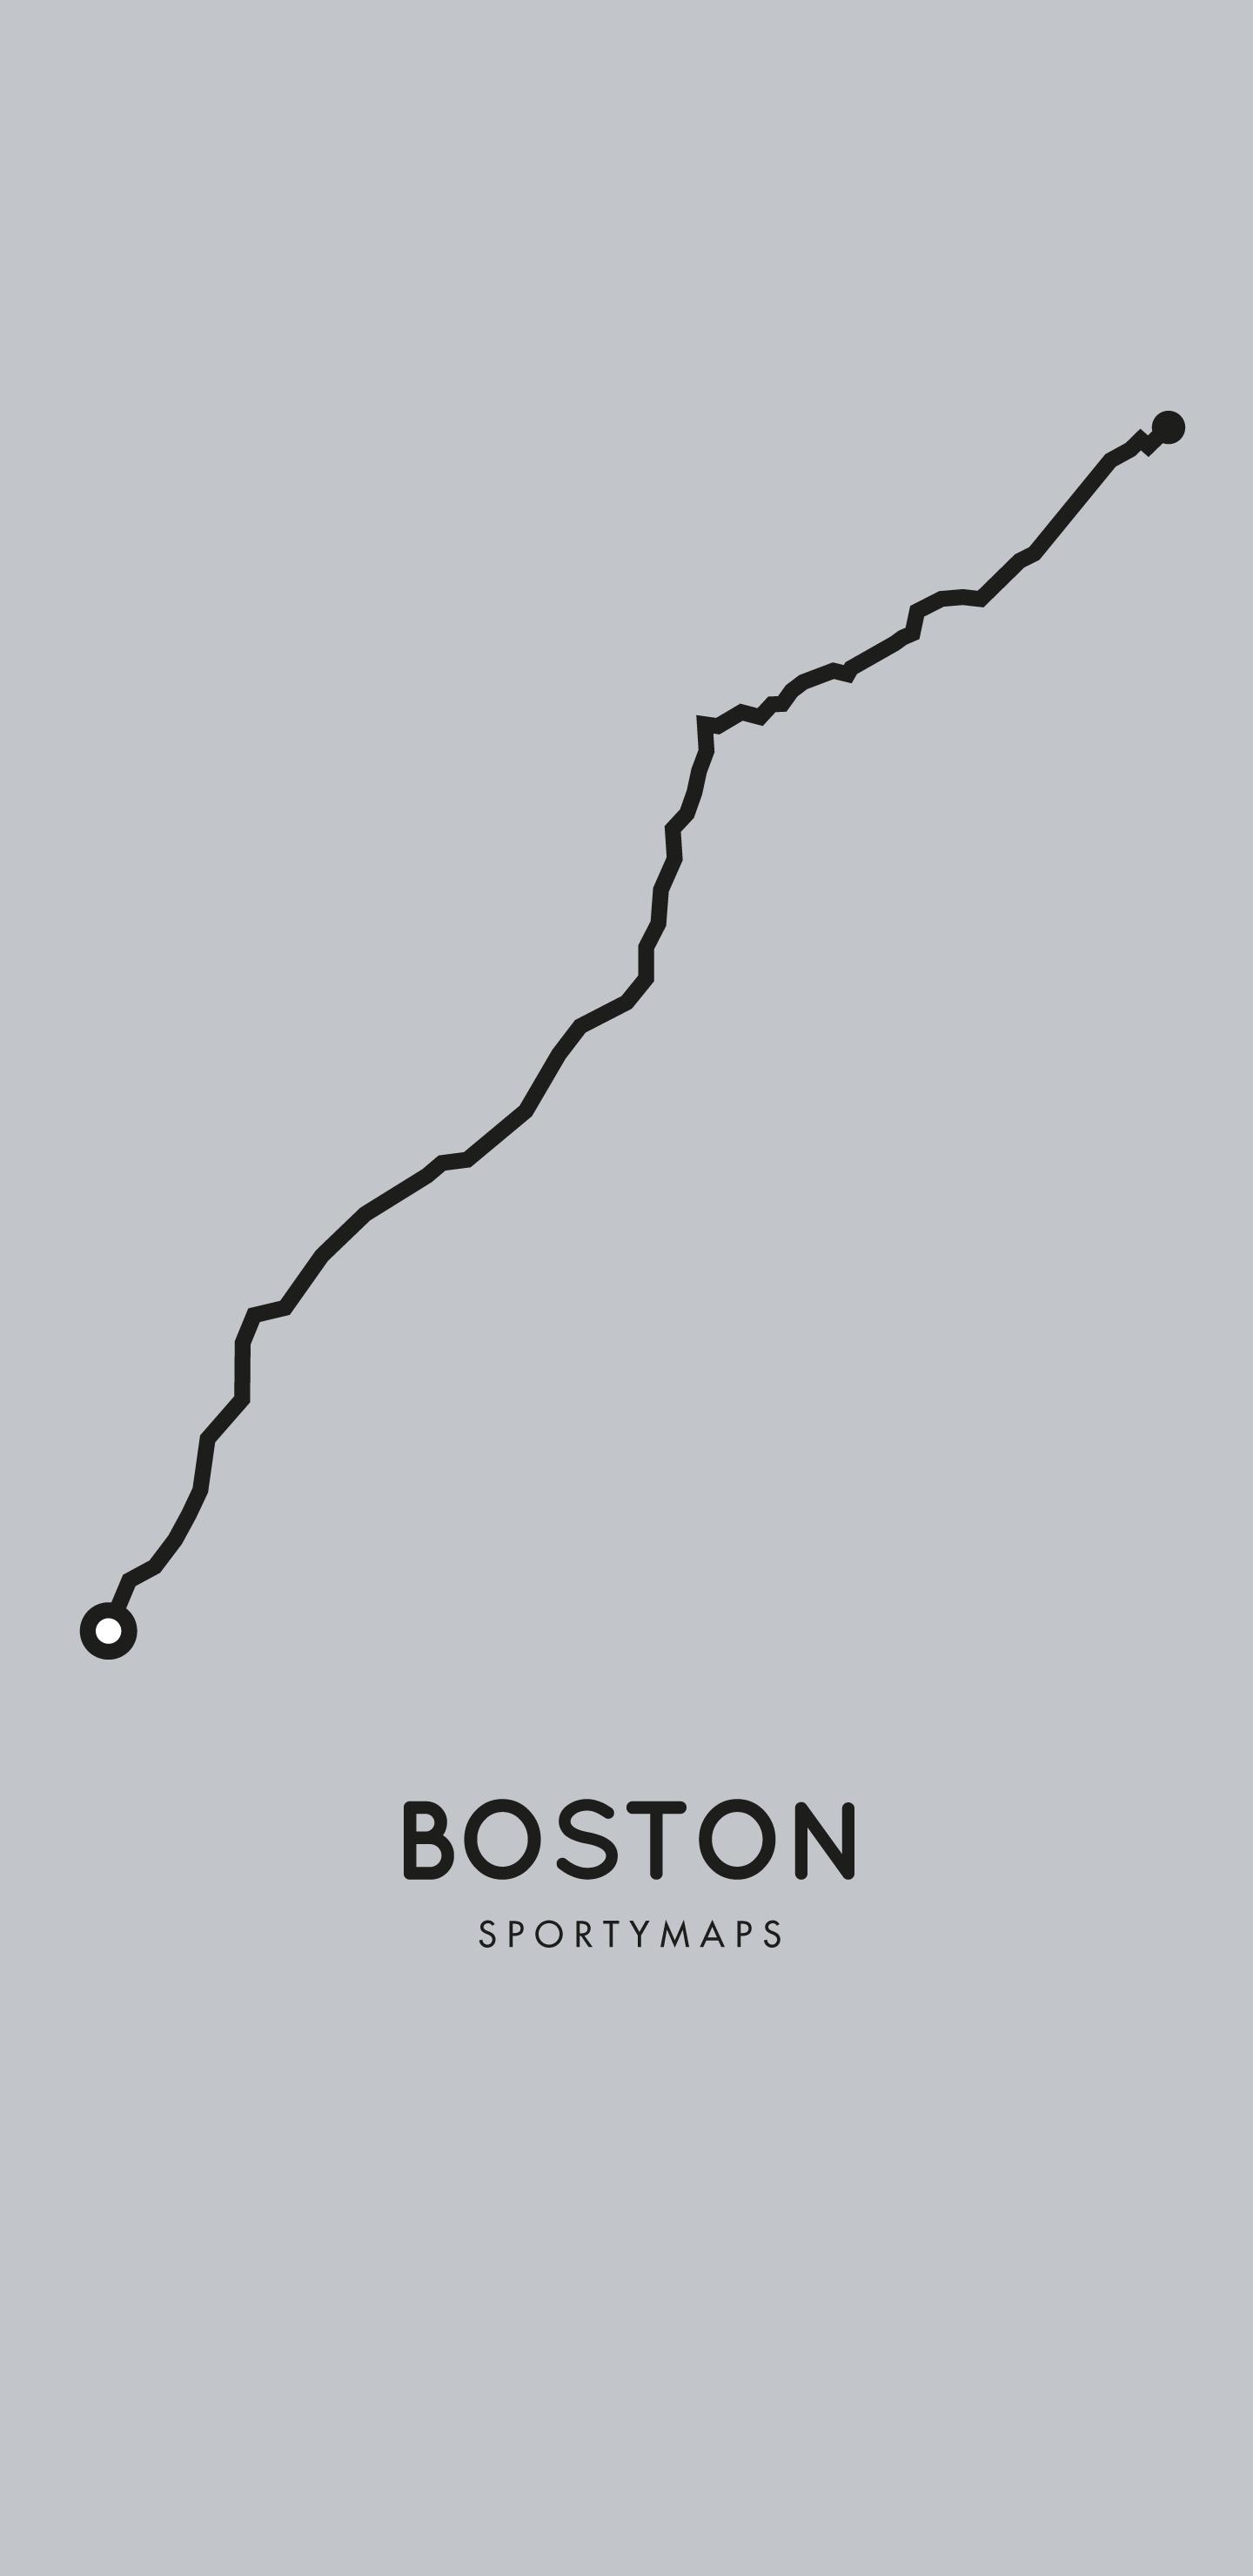 Sportymaps-Boston-marathon-gray